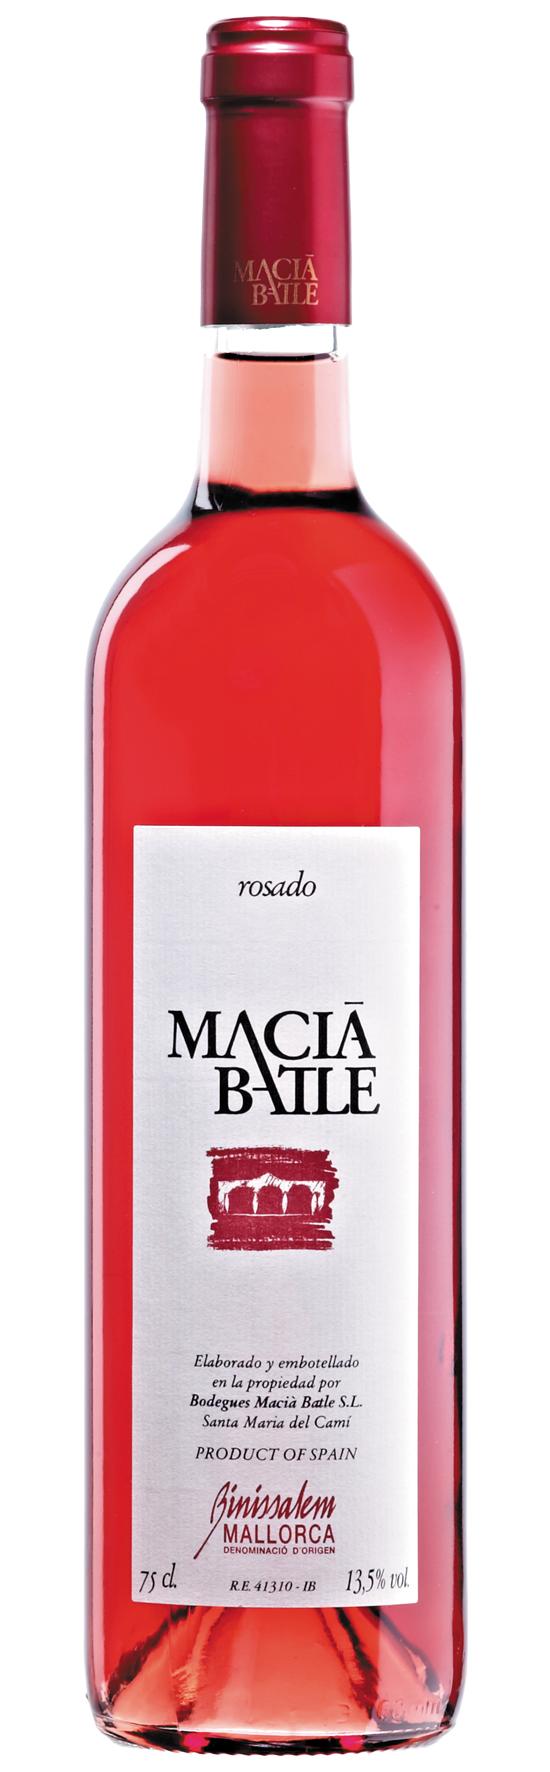 2016 Macia Batle Rosado Mallorca Vi de la Terra